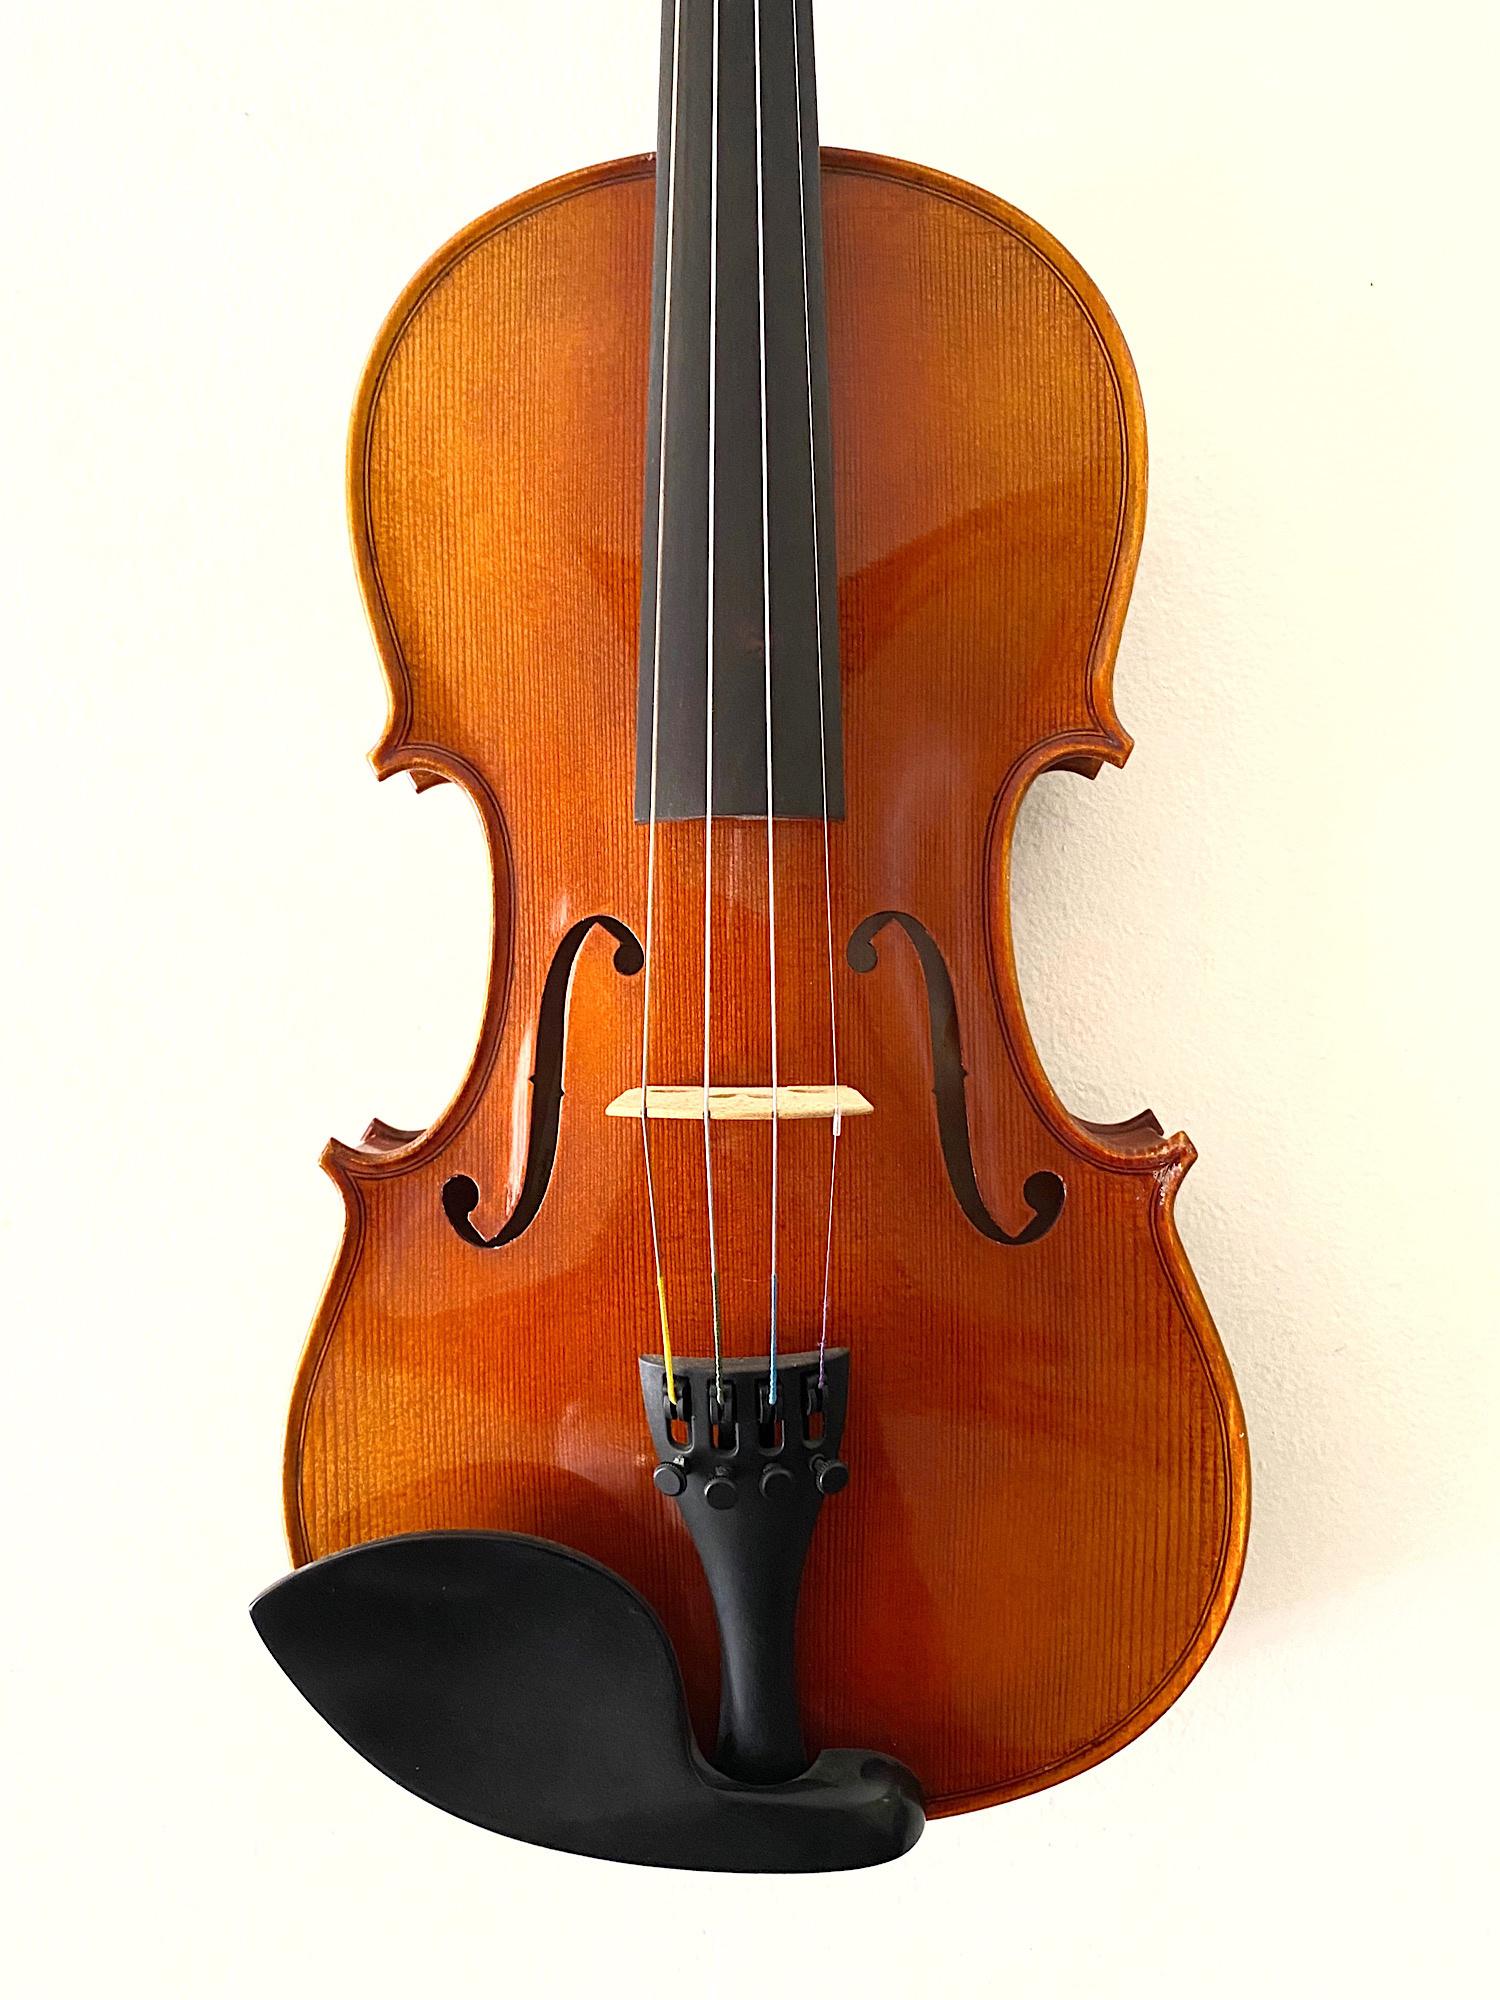 Kremona Kremona Flamed violin, Bulgaria, 2011